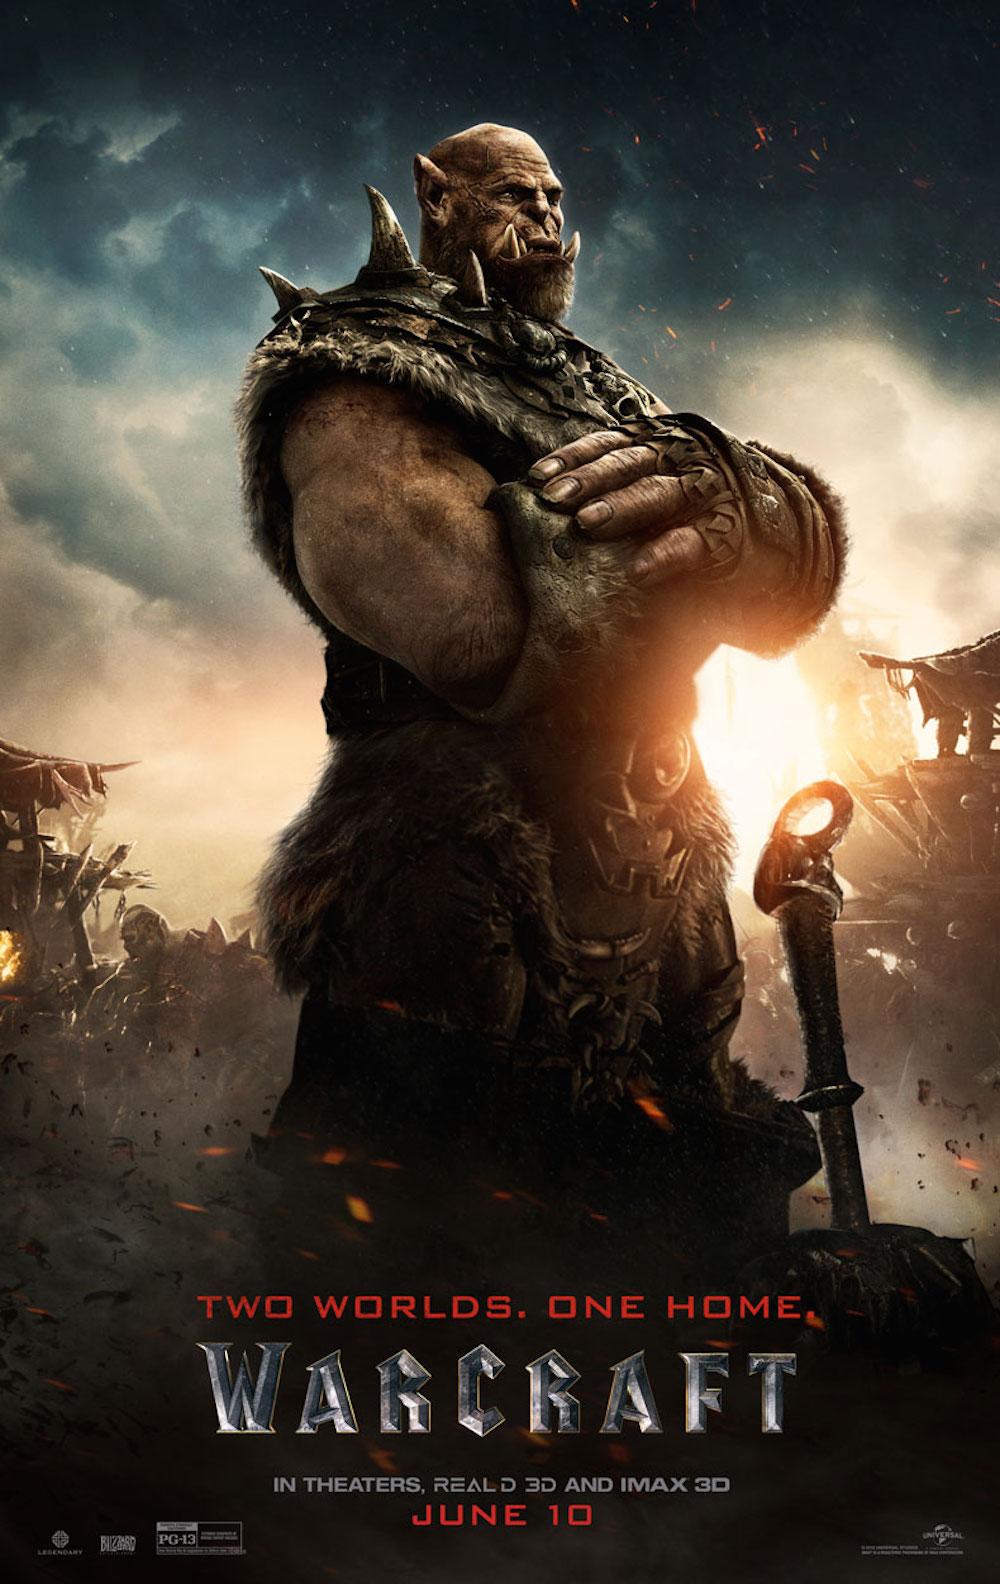 Warcraft poster orgrim